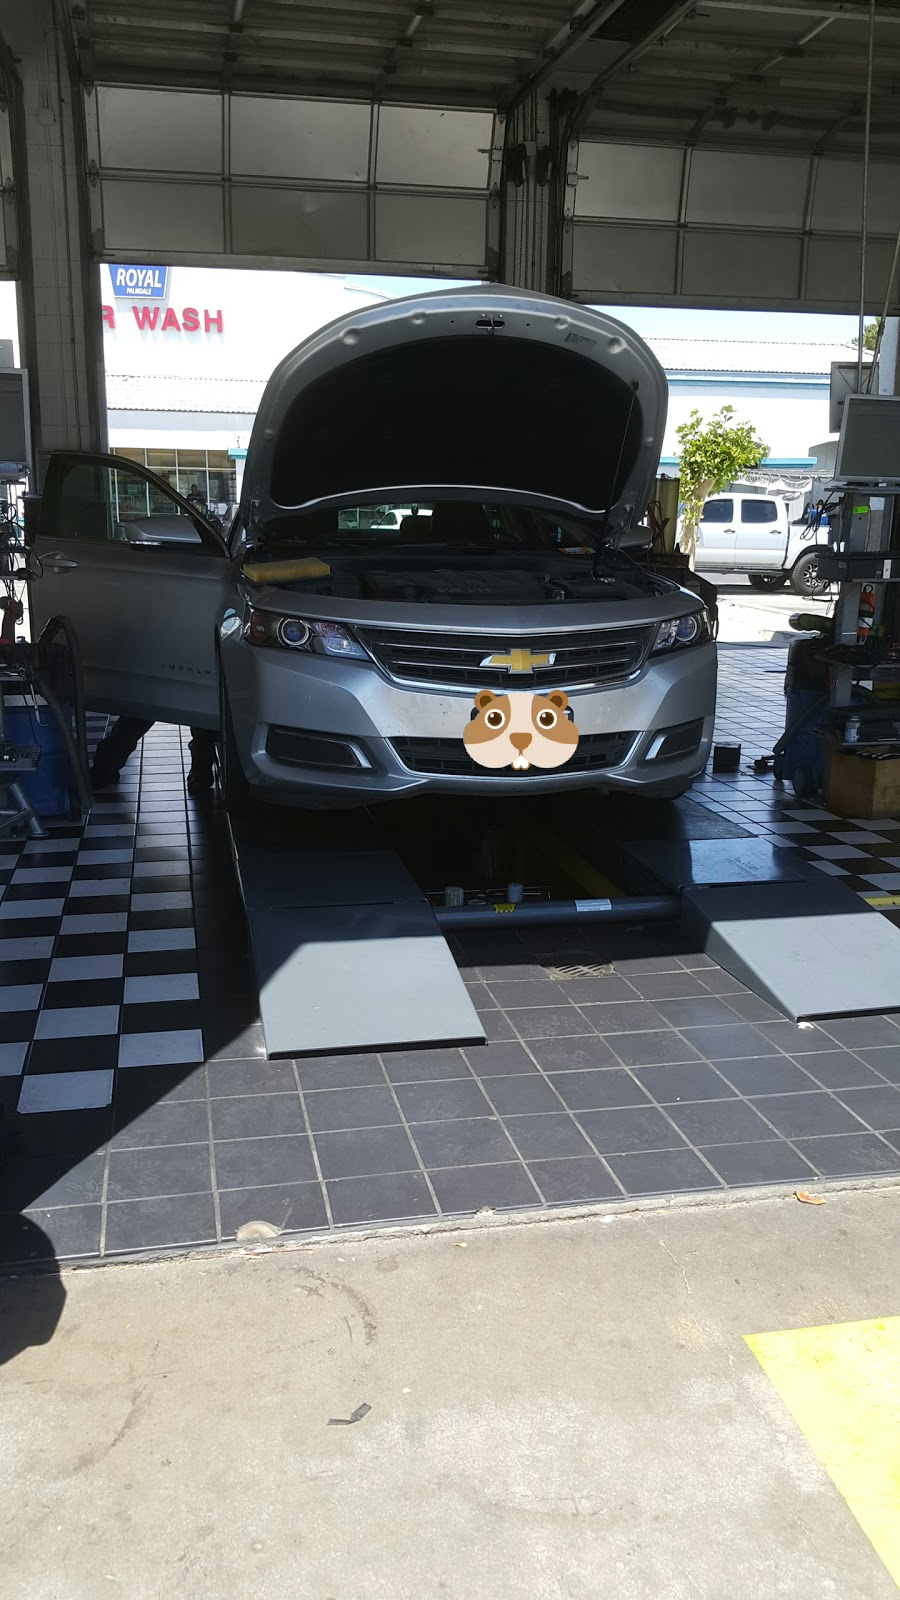 jiffy lube oil change center car repair 2613 e palmdale blvd palmdale ca 93550 usa. Black Bedroom Furniture Sets. Home Design Ideas